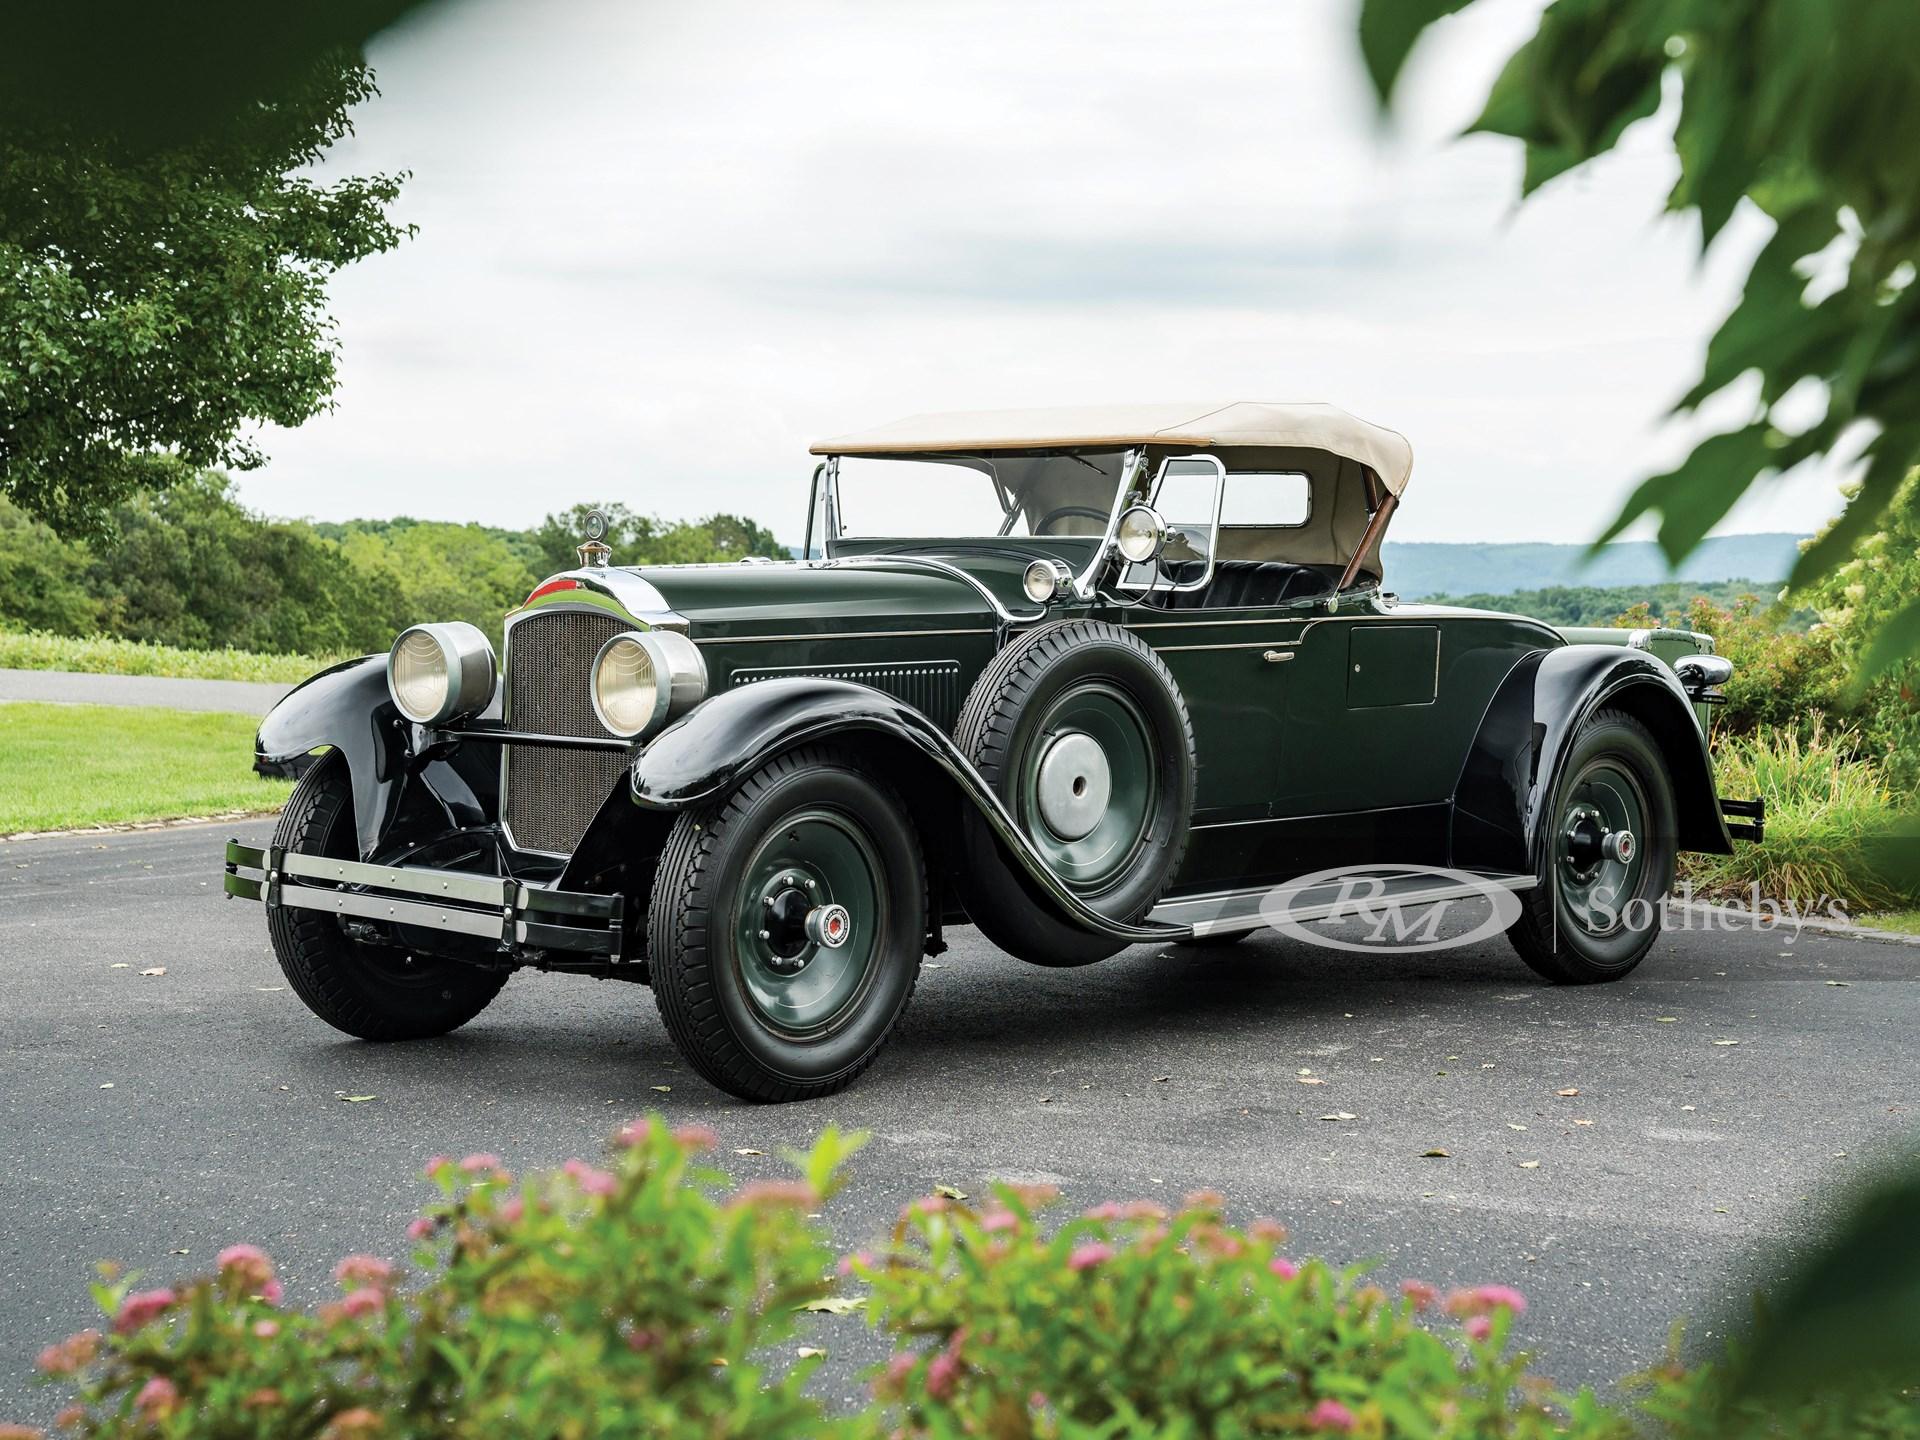 1928 Packard Six Roadster